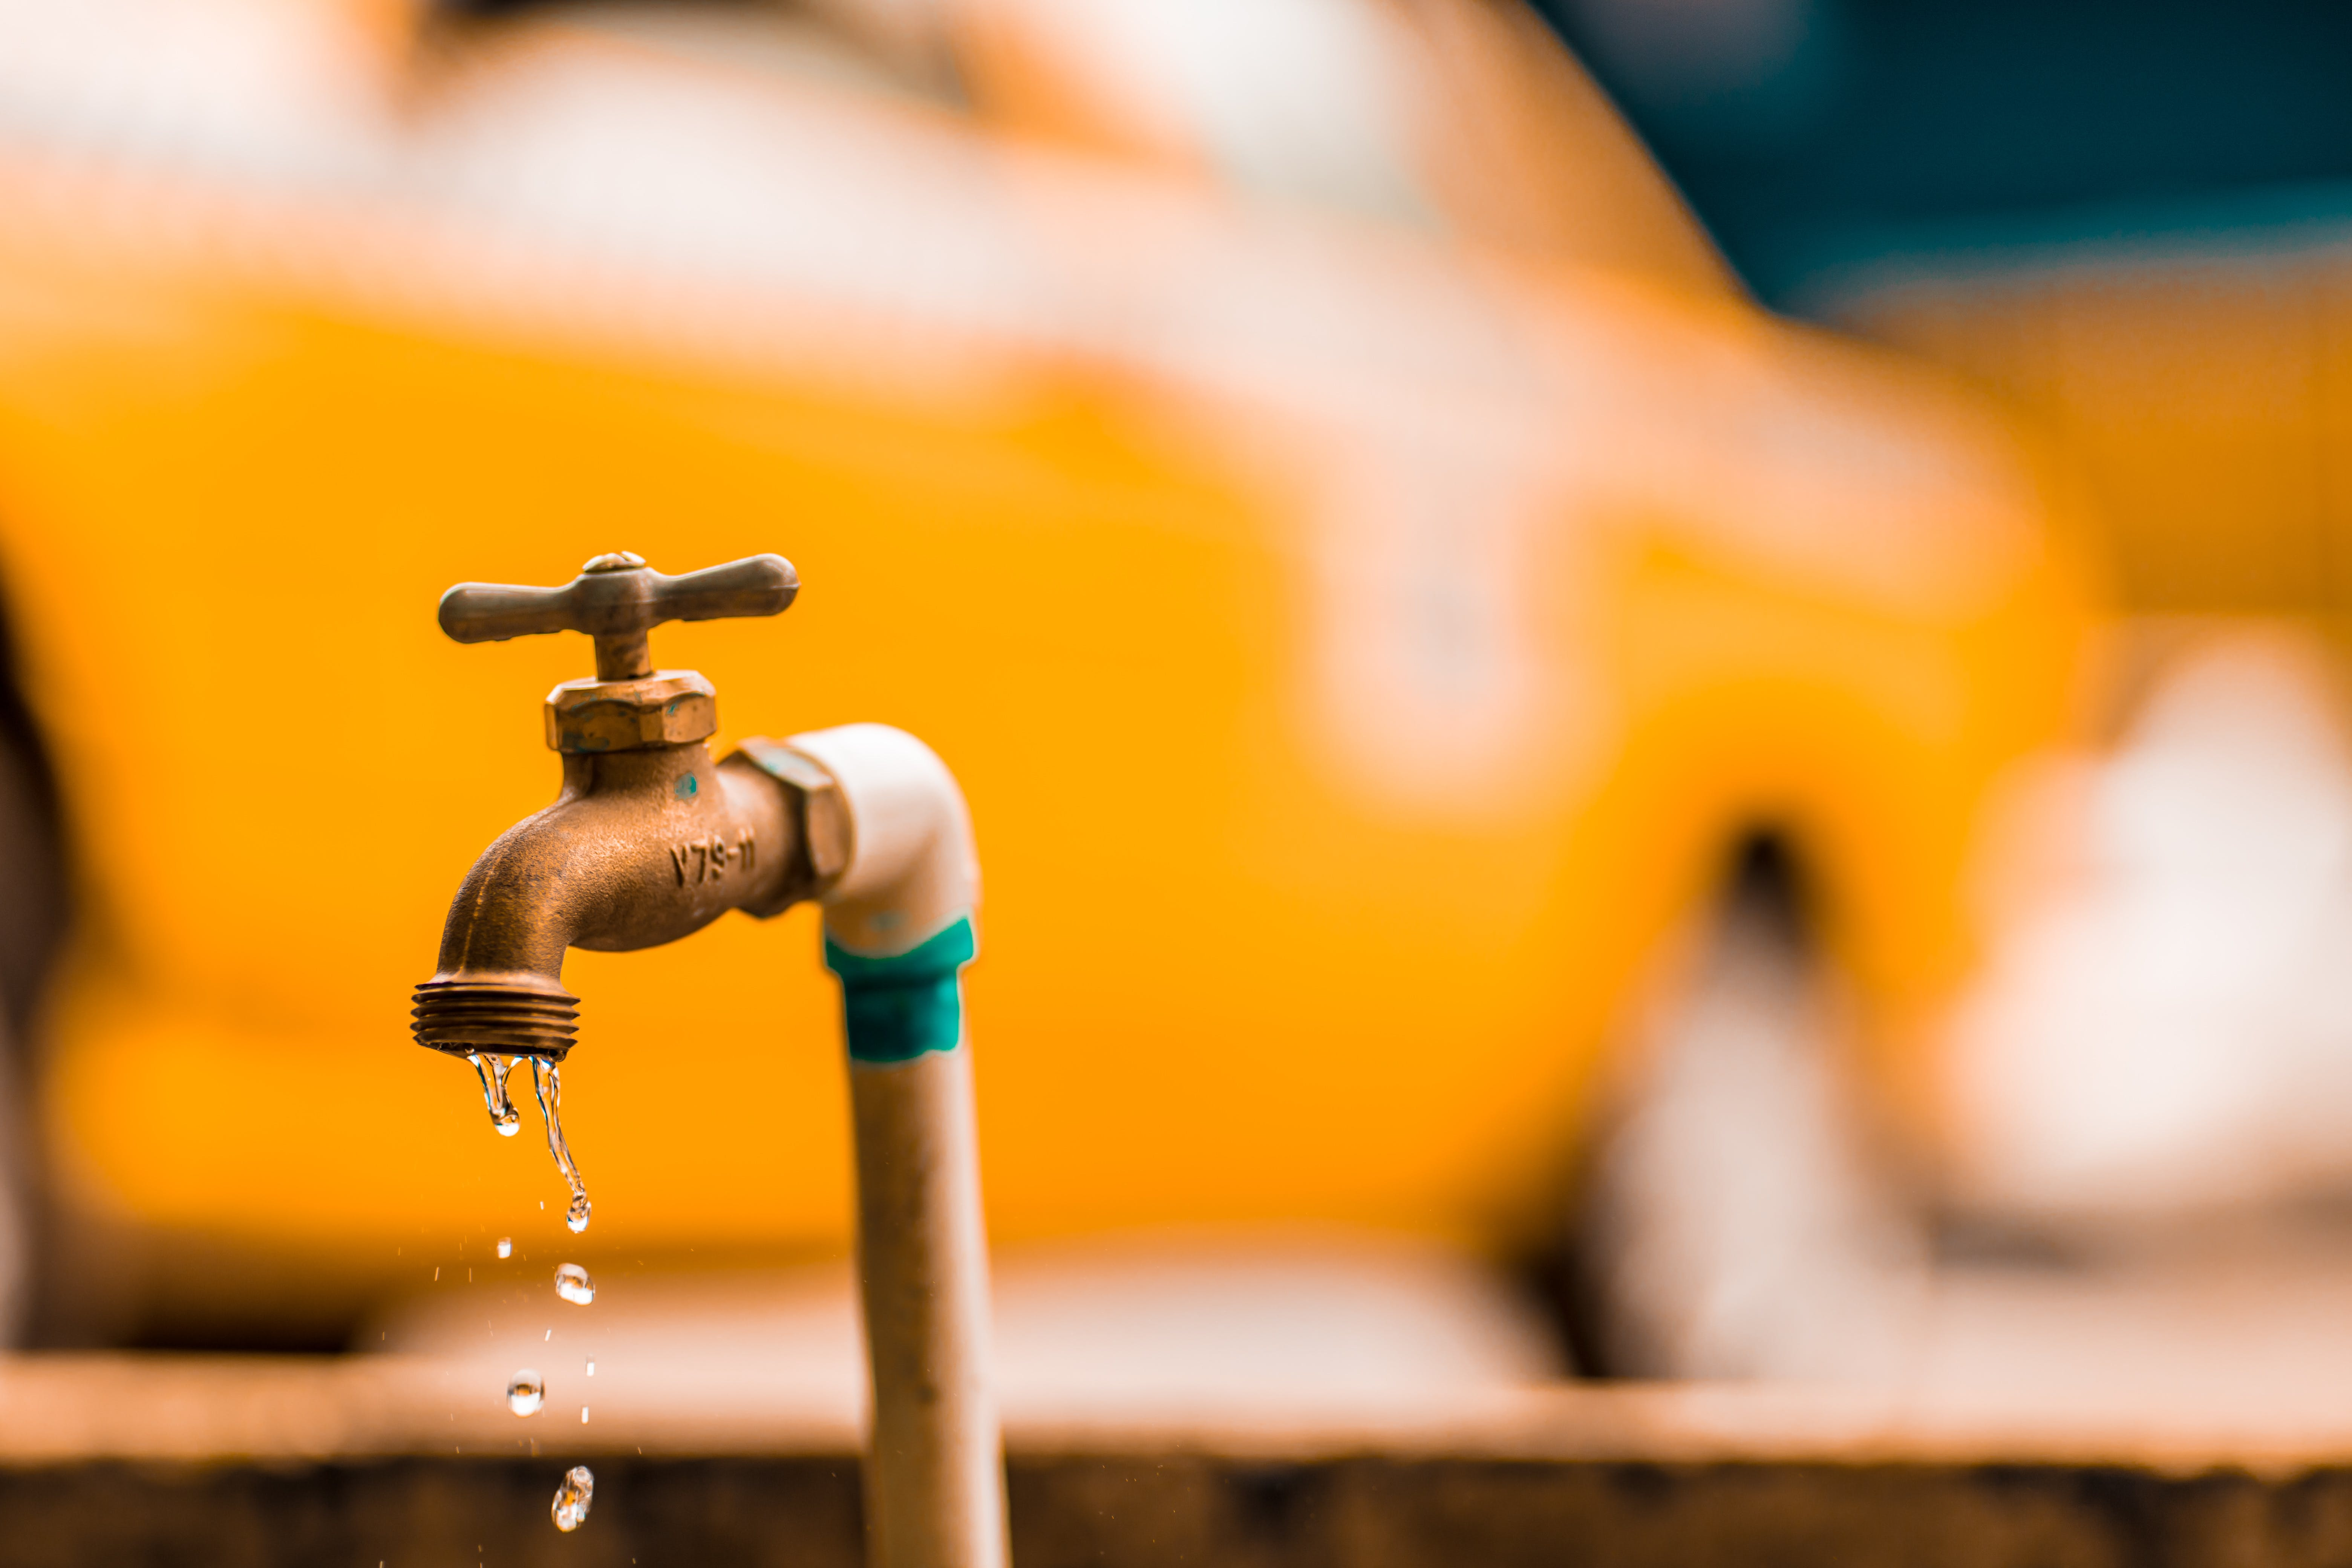 H2O, ぼかし, アクション, インドアの無料の写真素材